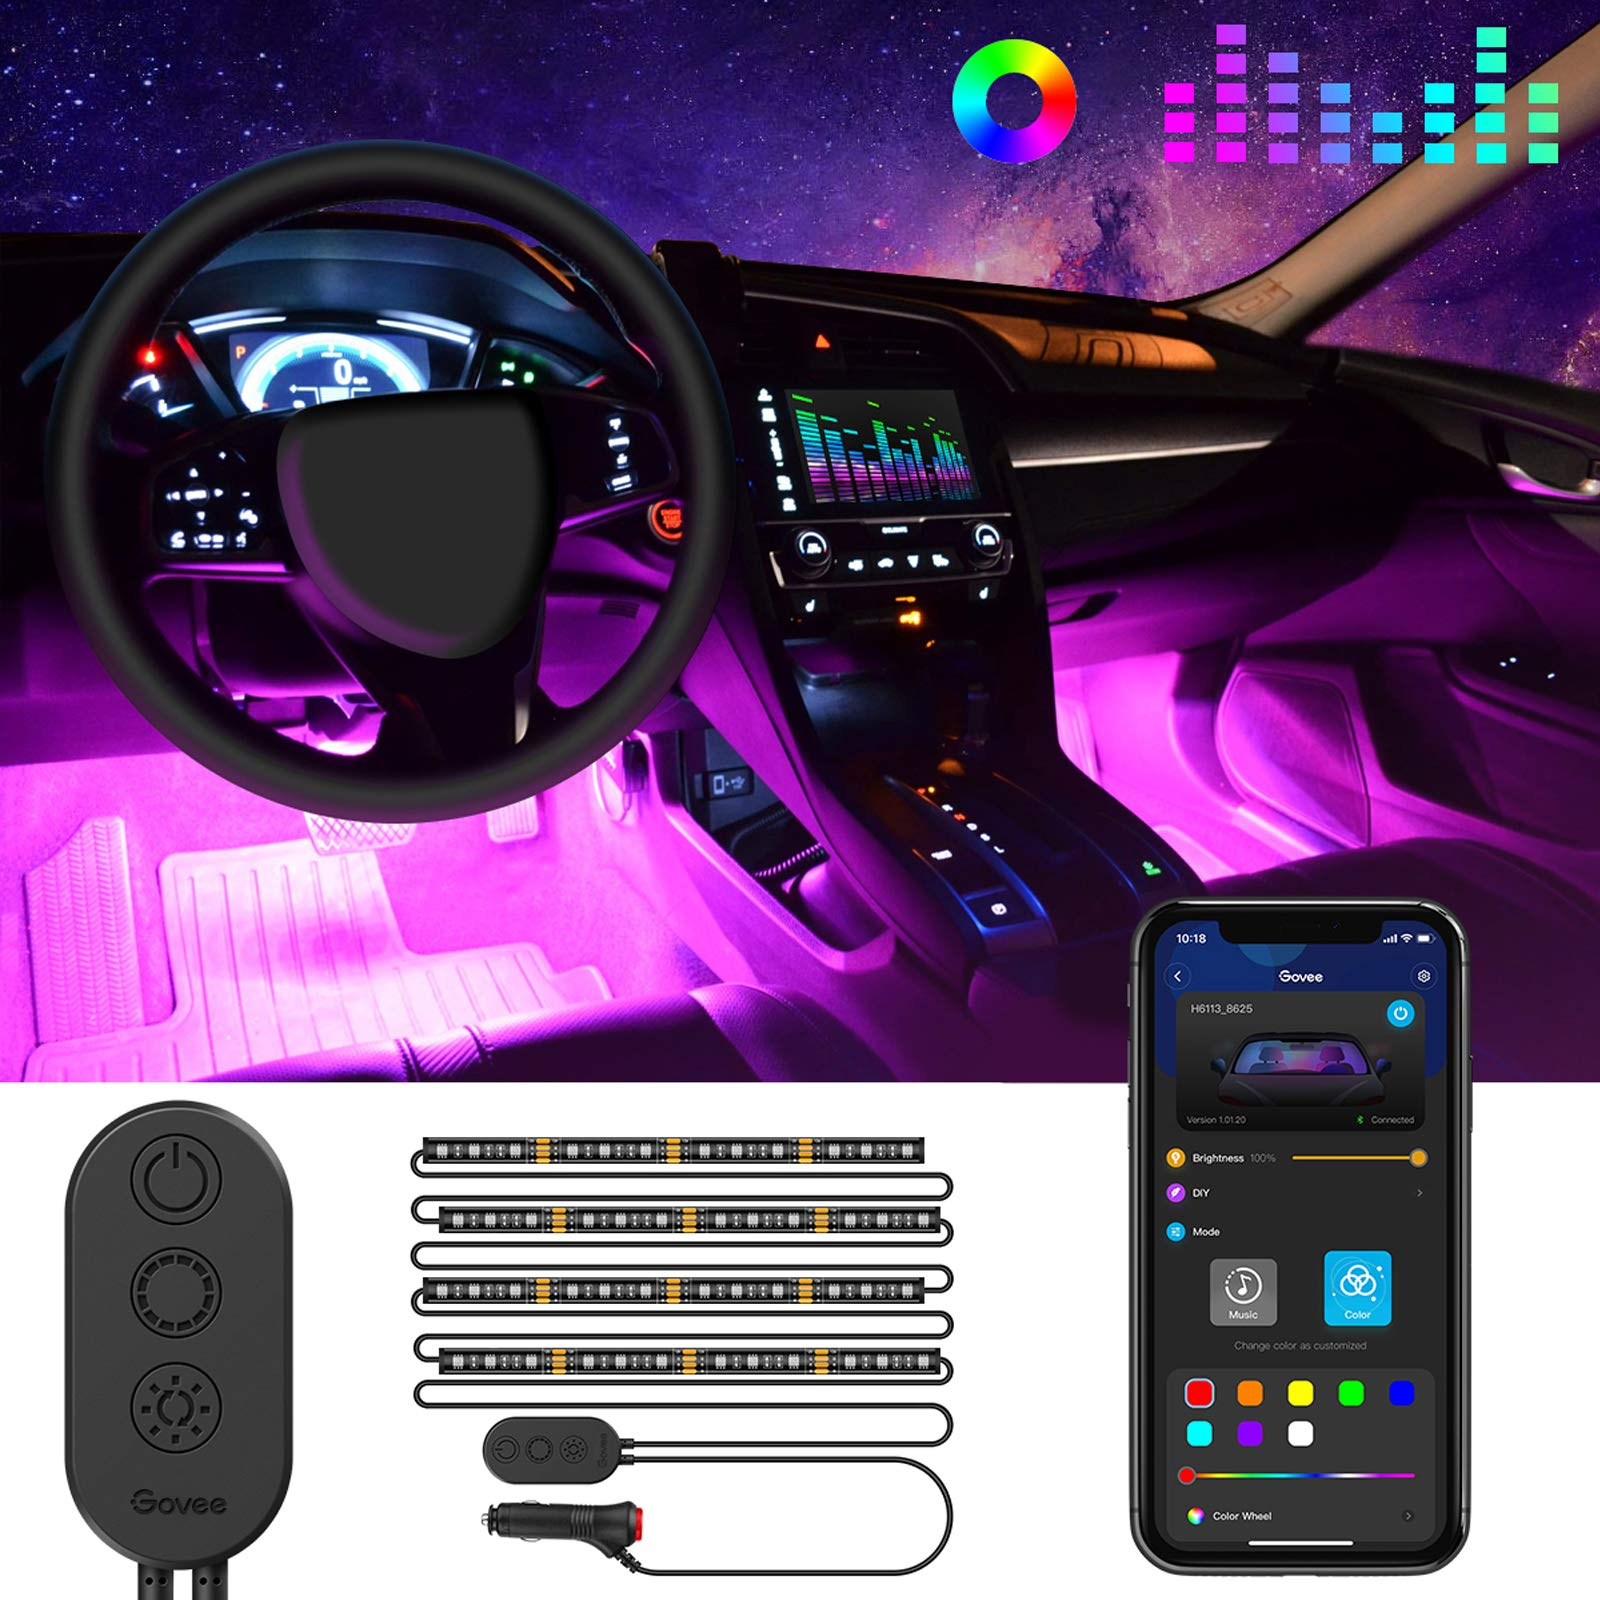 MINGER Unifilar Car LED Strip Light, 4pcs 48 LED APP Controller Car Interior Lights, Waterproof Multicolor Music Under Dash Lighting Kits for iPhone Android Smart Phone, Car Charger Included, DC 12V